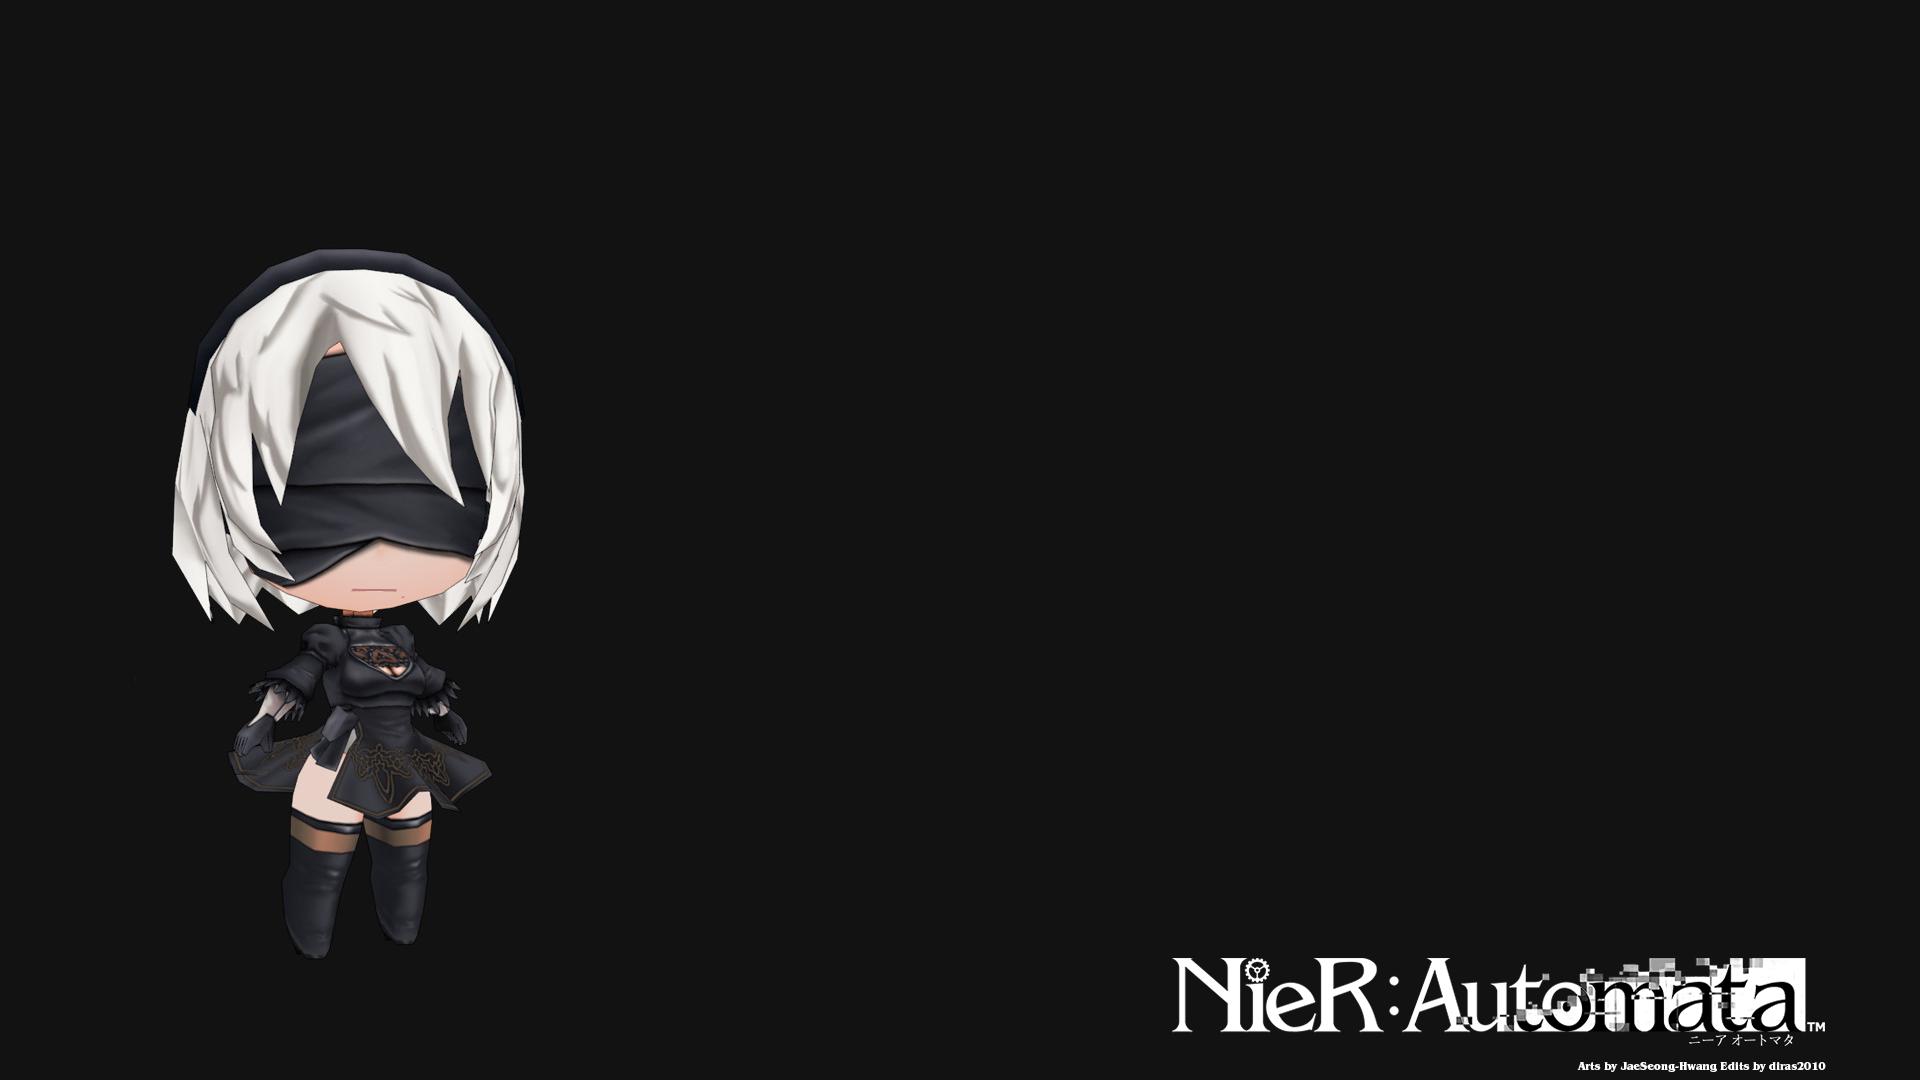 Nier Automata Emil Mask Sticker By Sugoipotato Automata Nier Automata Neir Automata